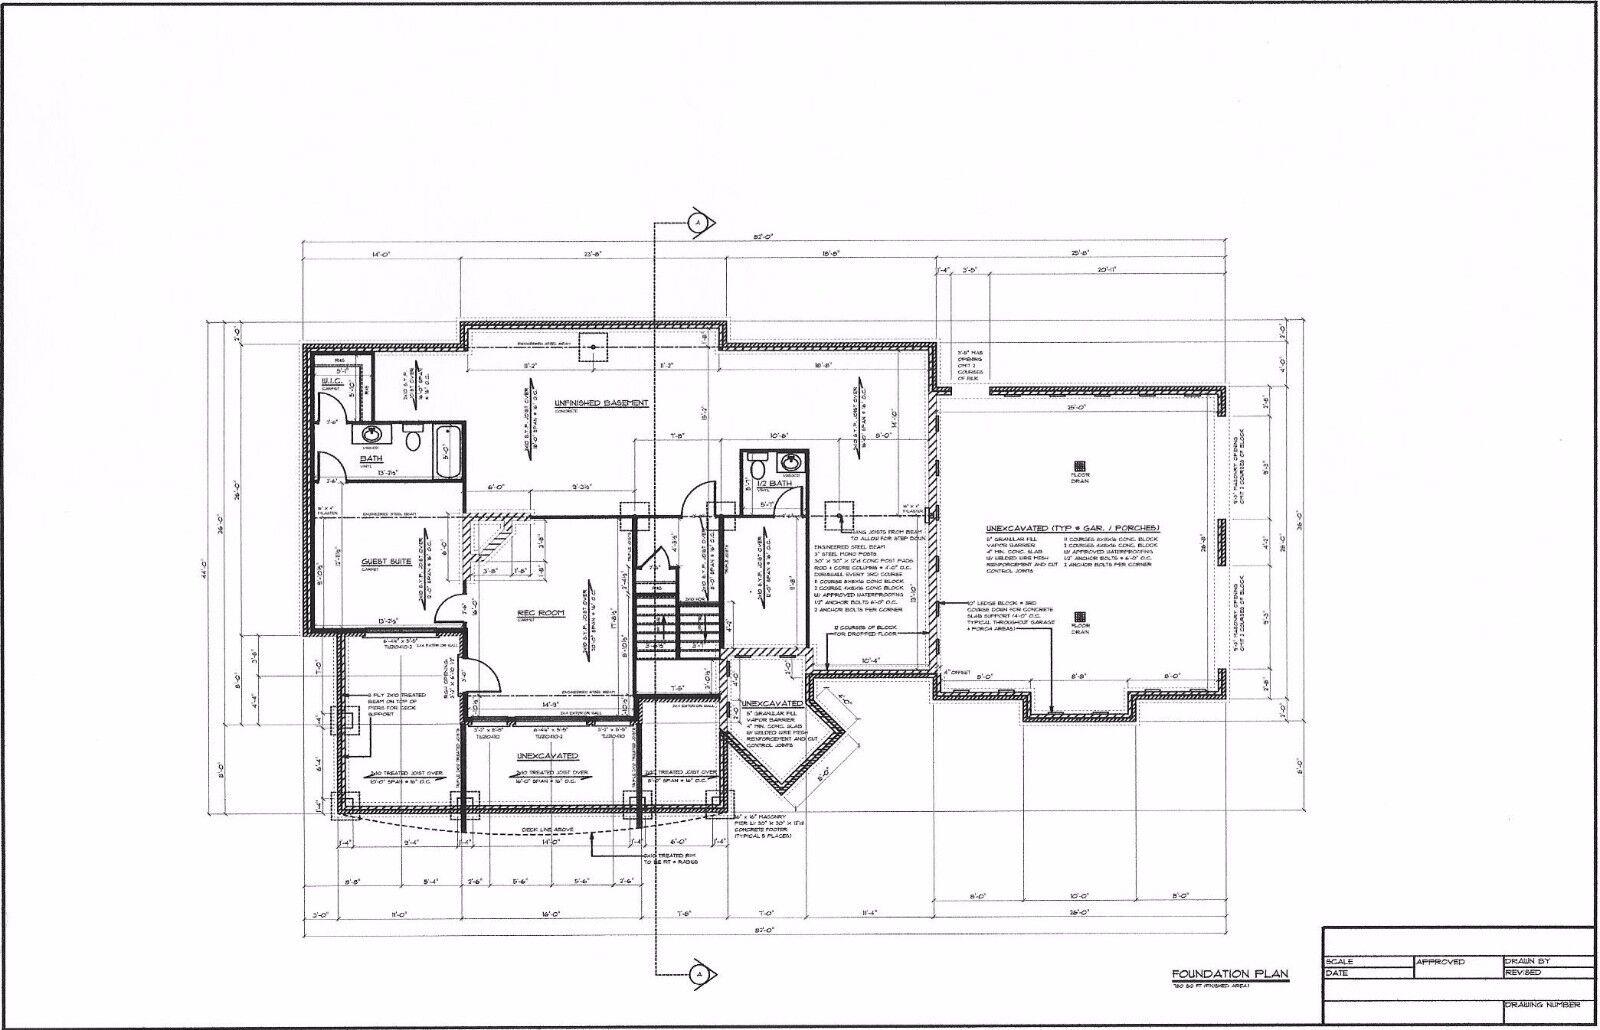 Full Set of two story 3 bedroom house plans 3,821 sq ft